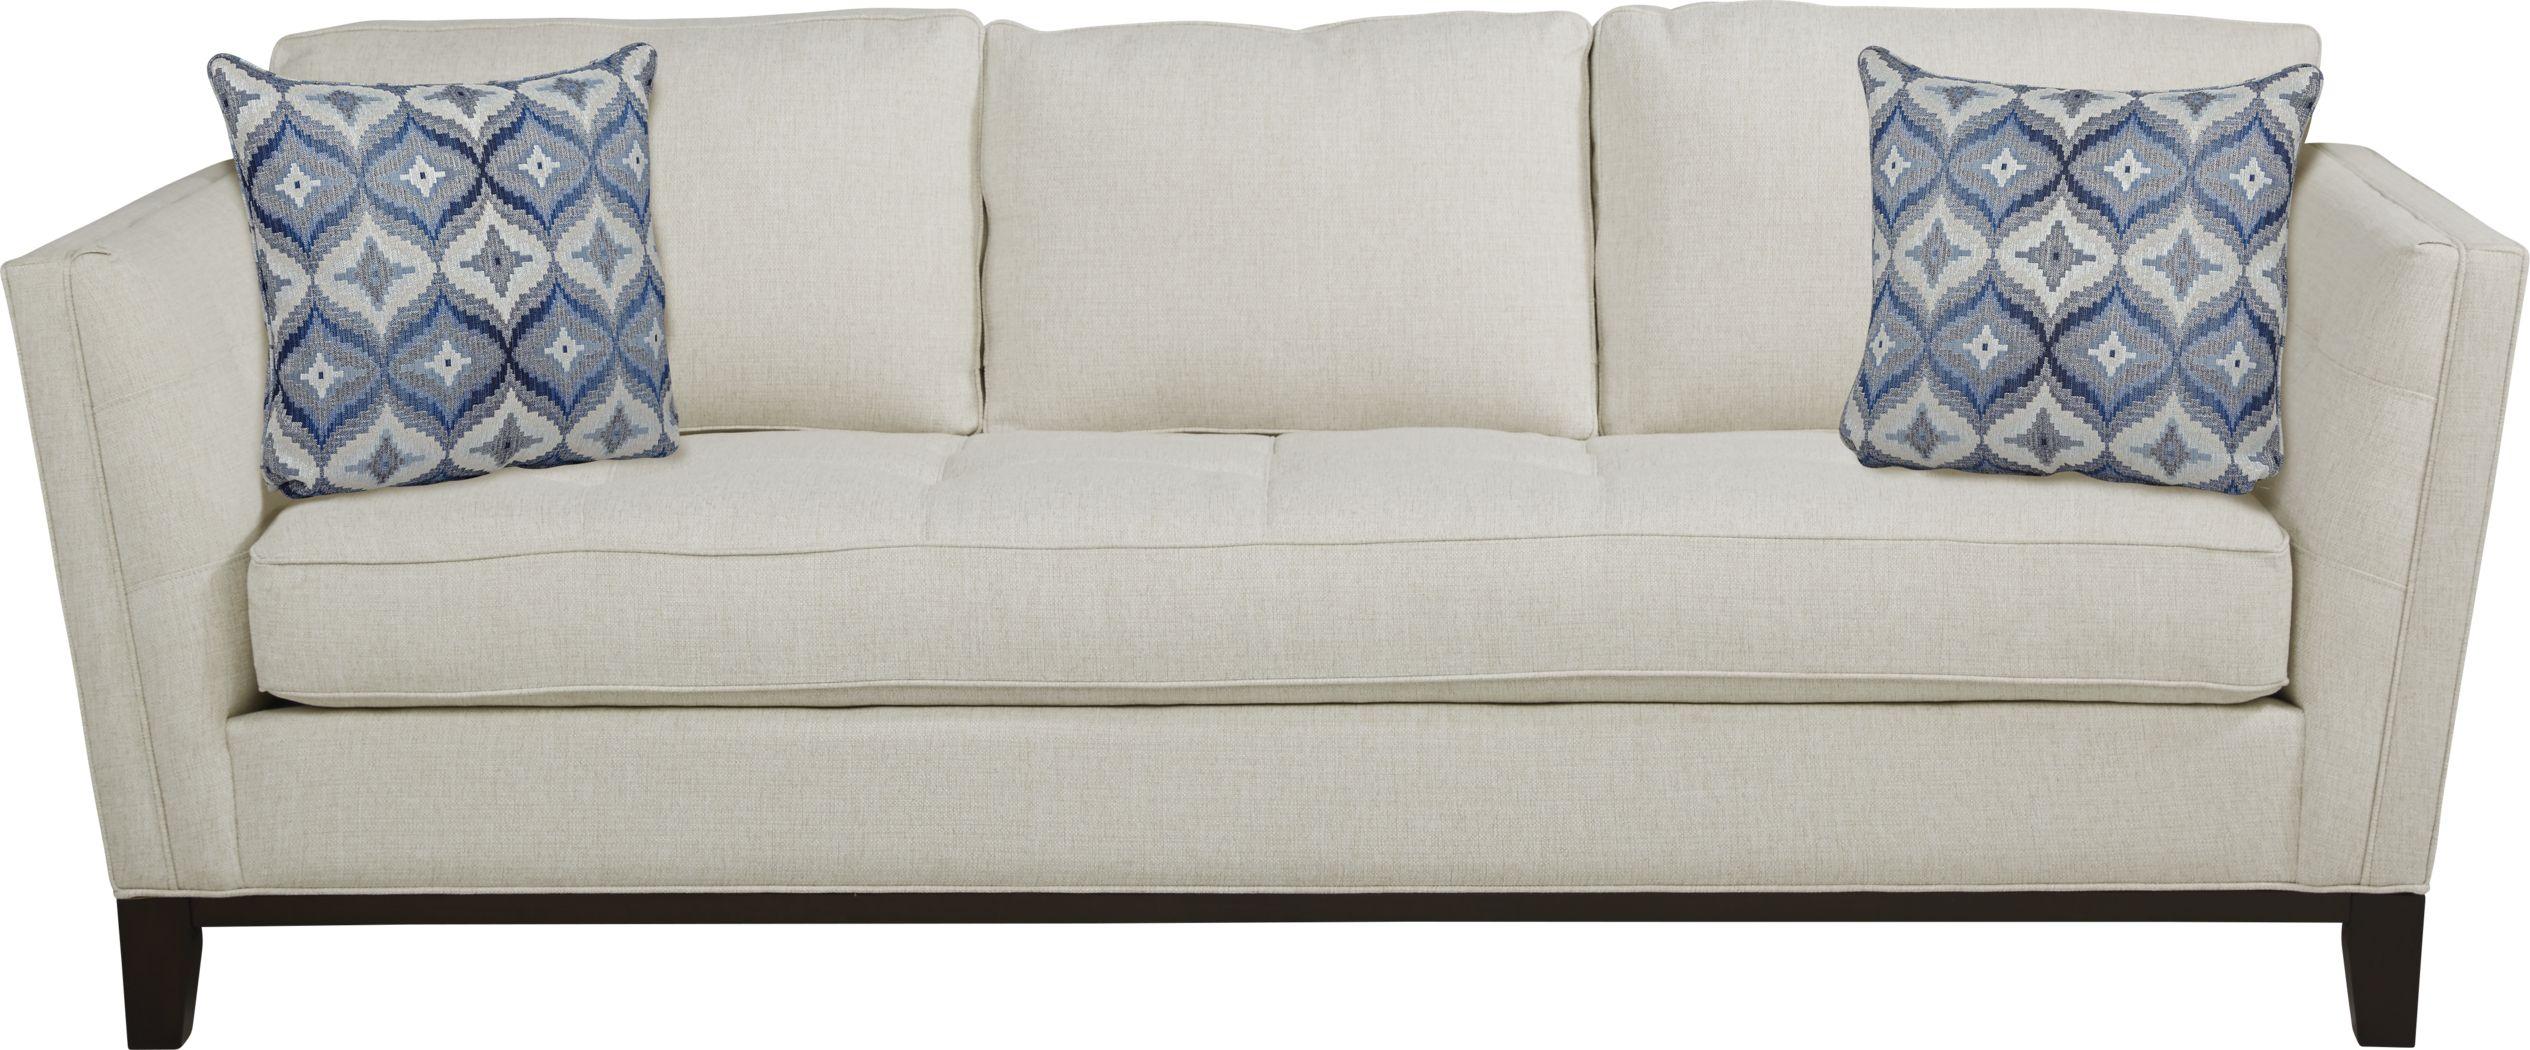 Cindy Crawford Home Central Boulevard Off-White Textured Gel Foam Sleeper